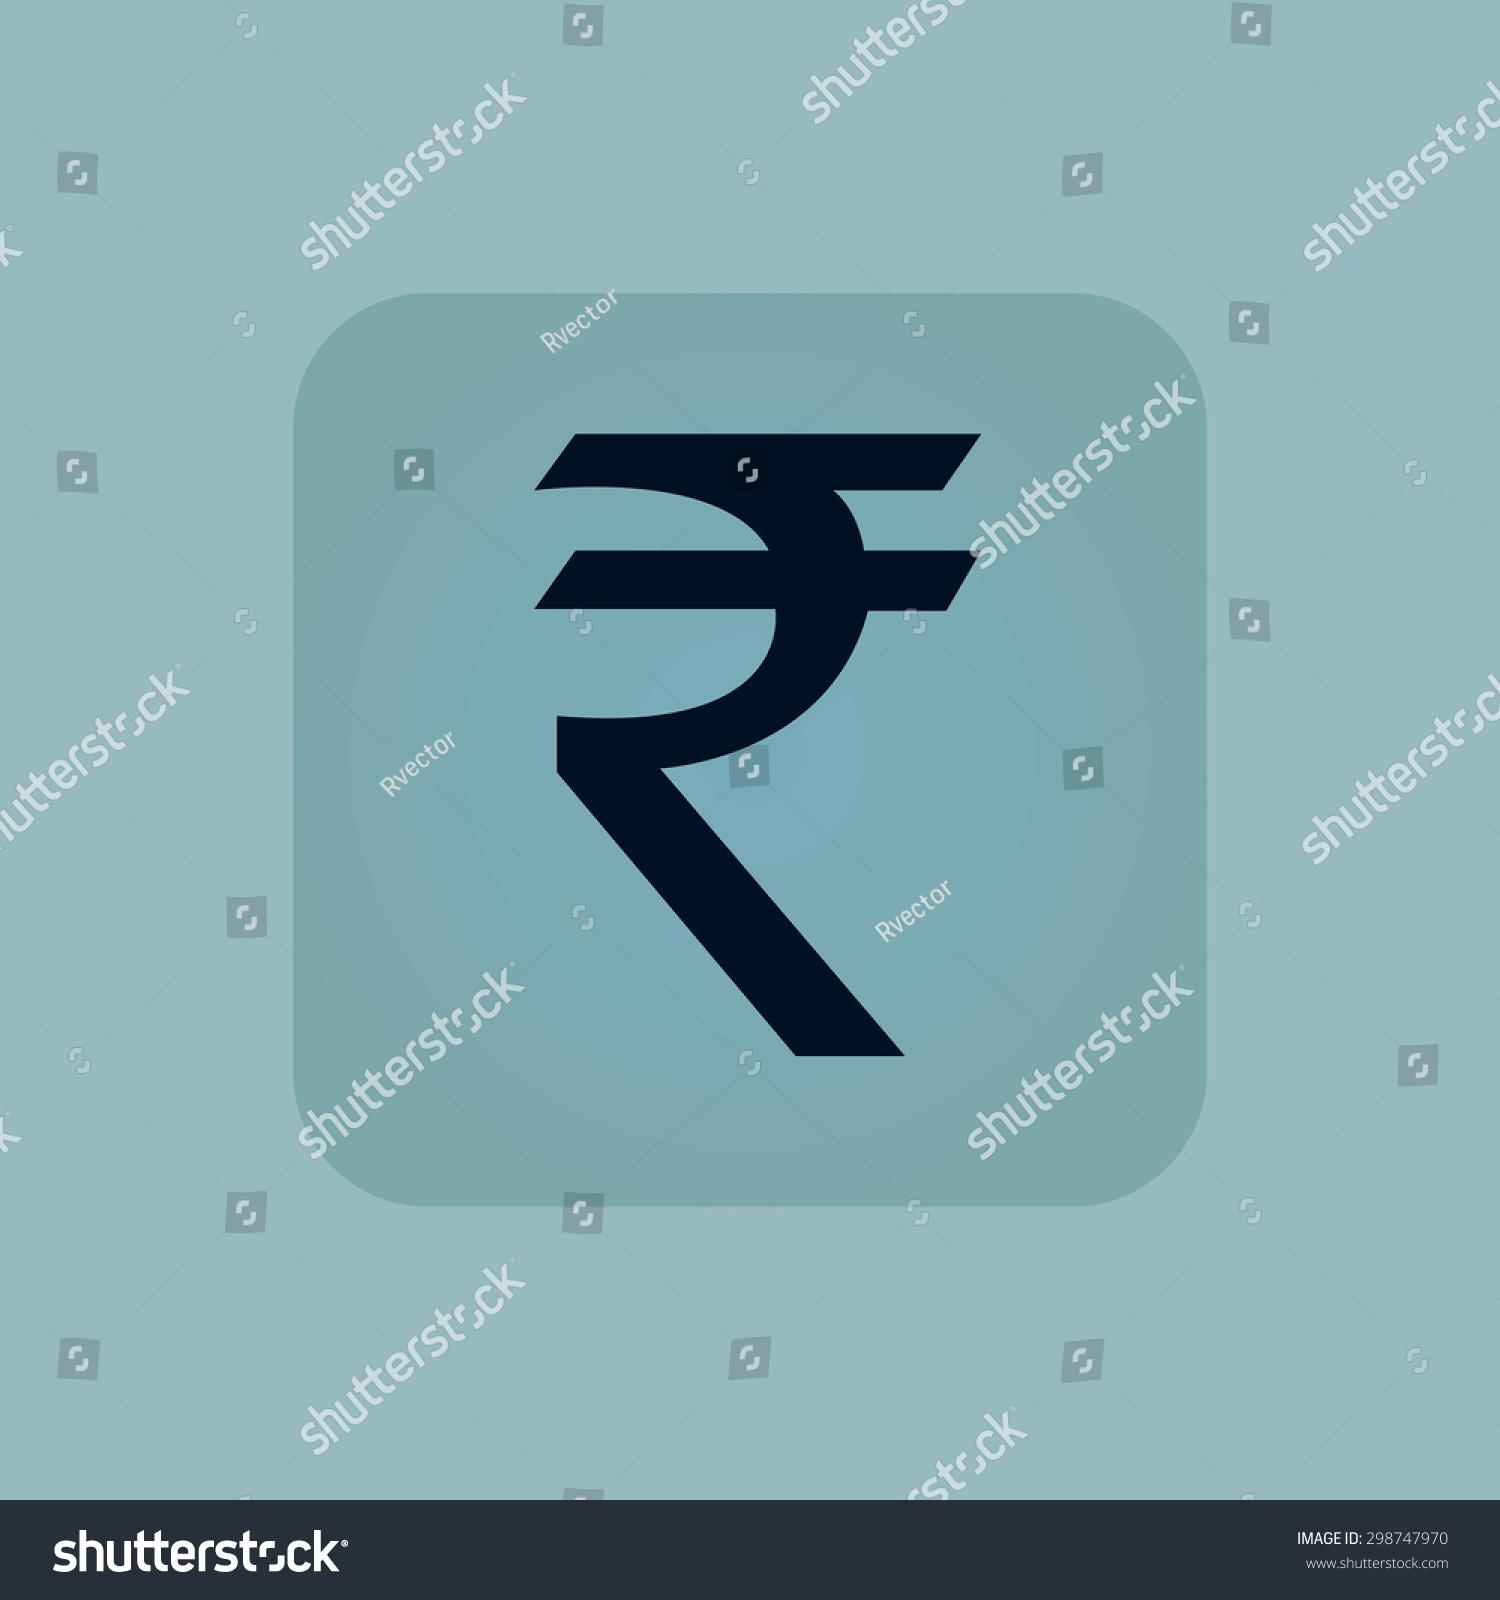 Indian rupee symbol square on pale stock vector 298747970 indian rupee symbol in square on pale blue background biocorpaavc Choice Image